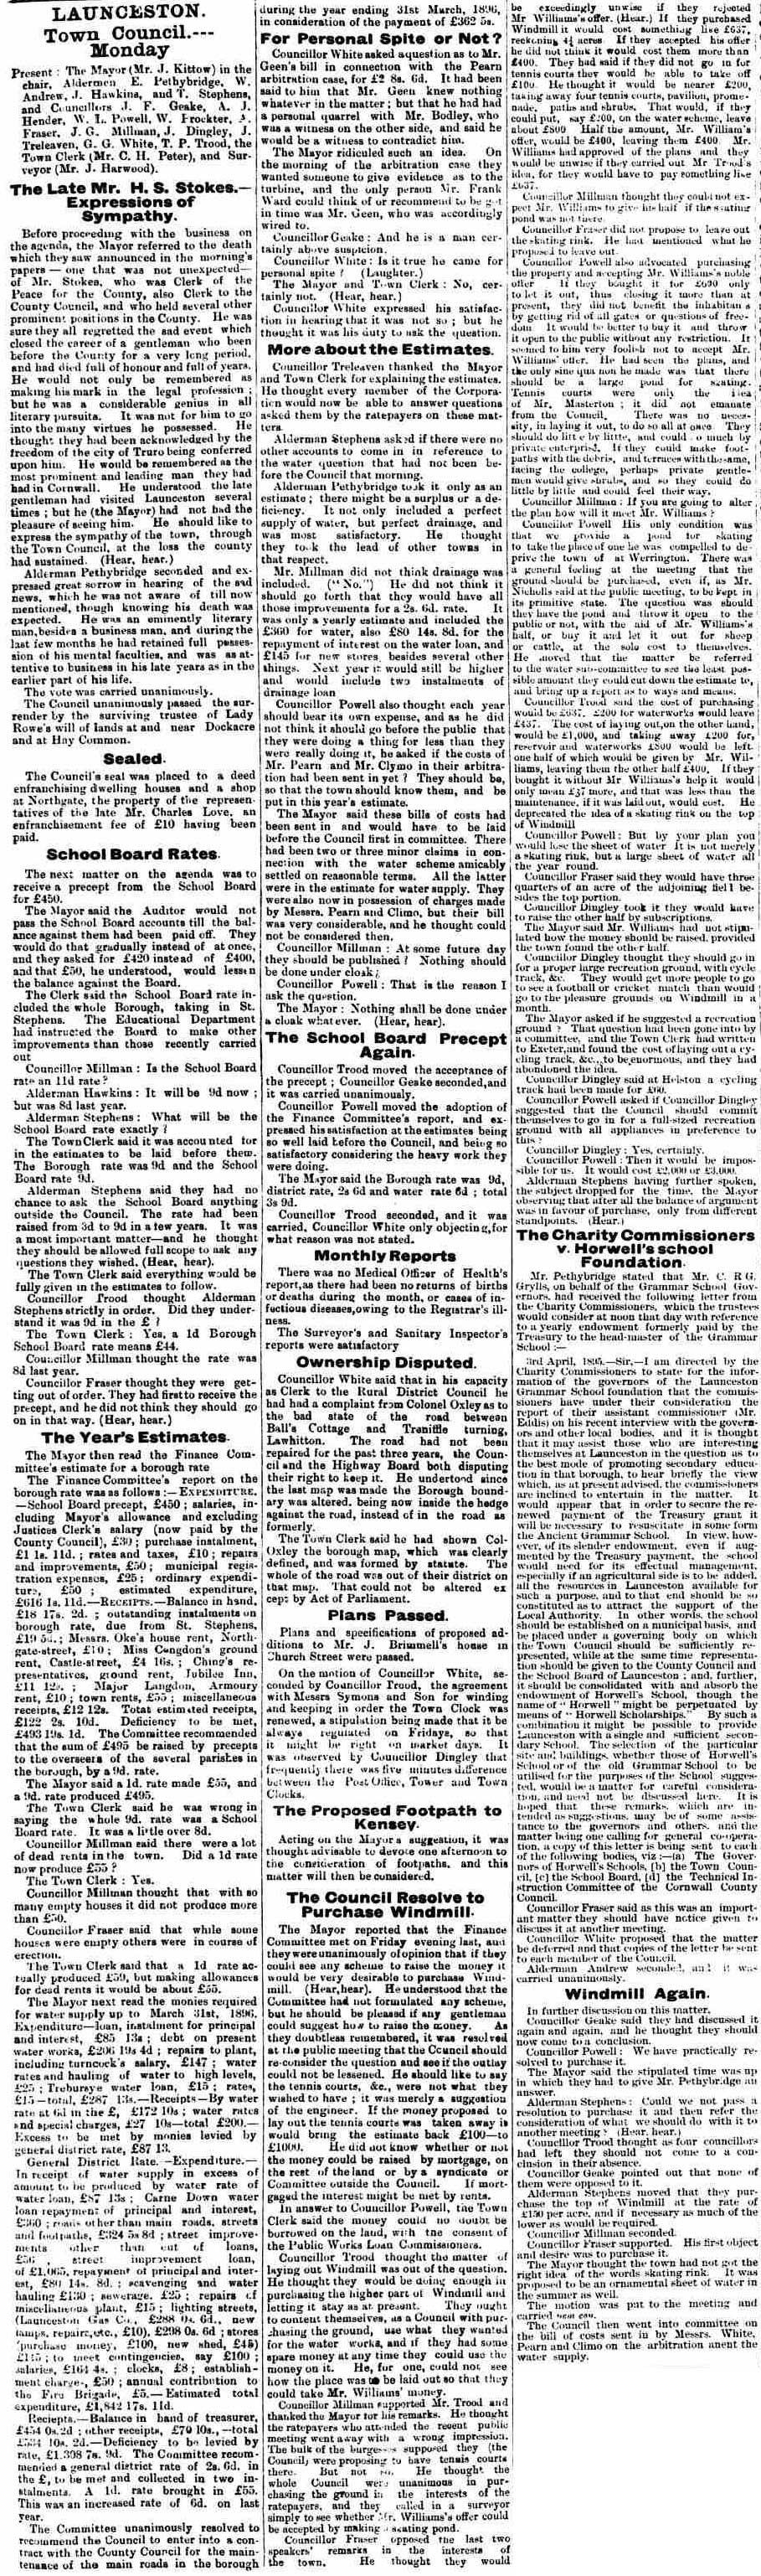 13 April 1895